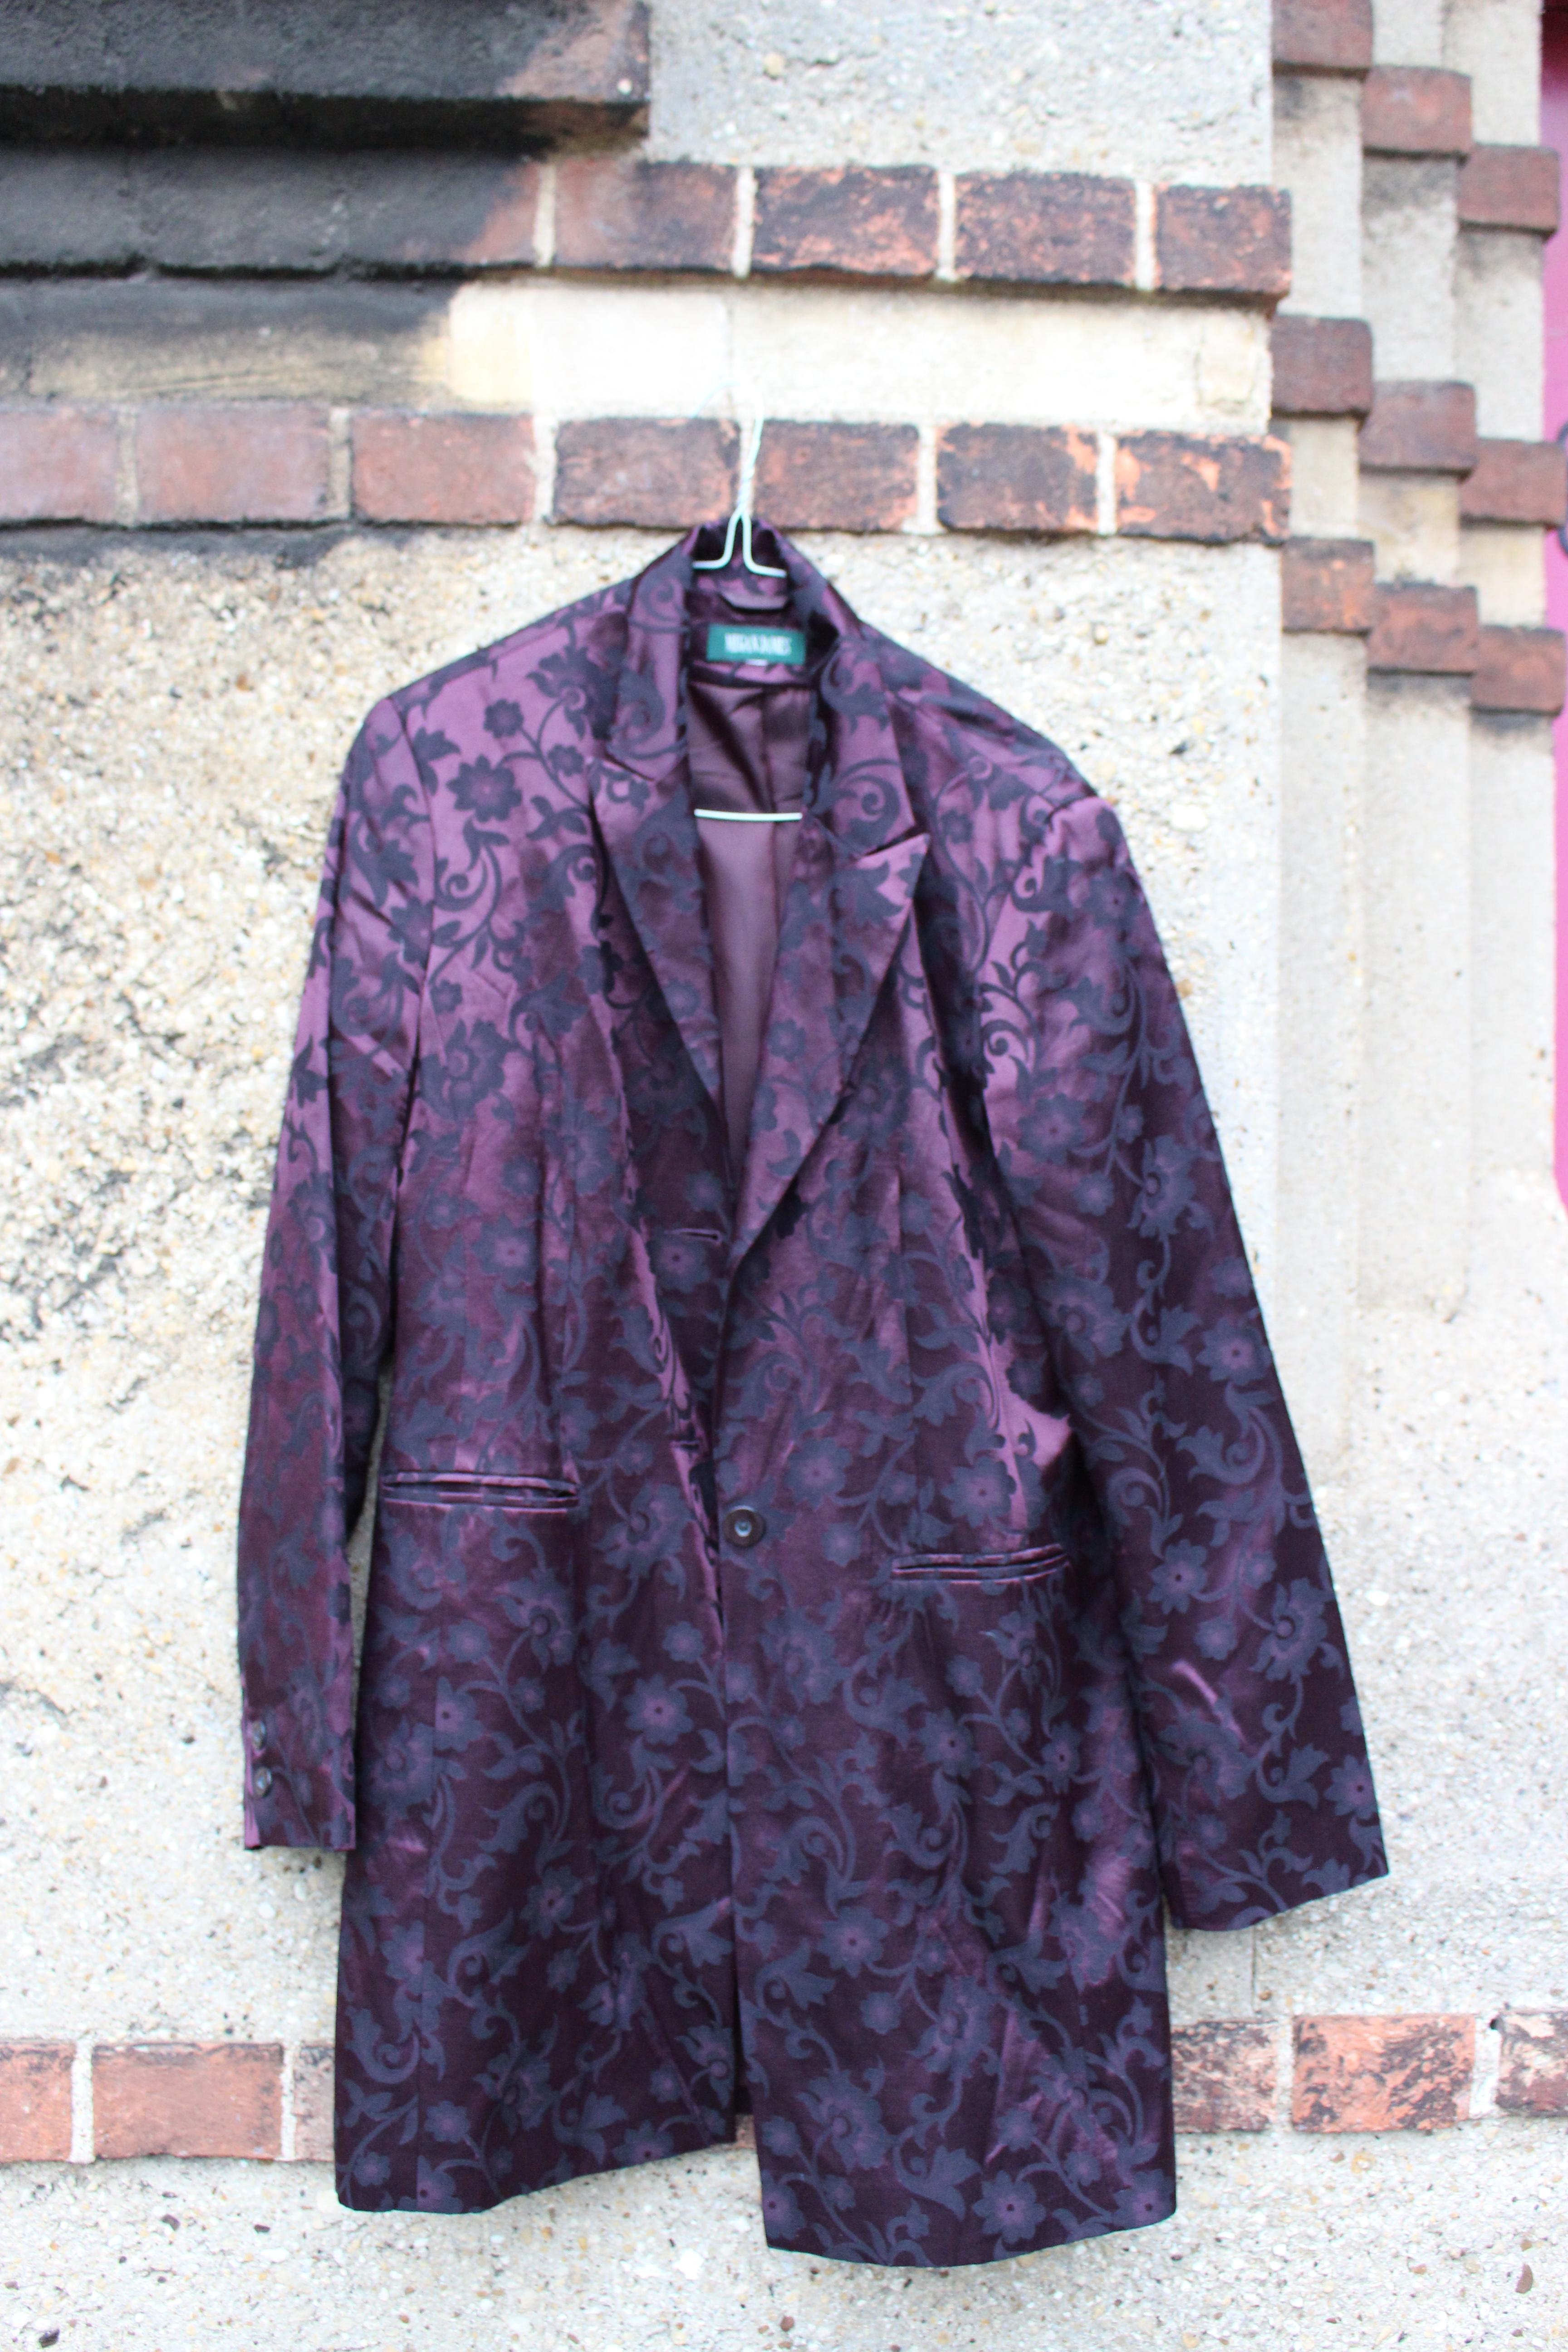 Megan James shiny maroon metallic flower-print jacket, from Unicorn, 5 Ship Street, Oxford